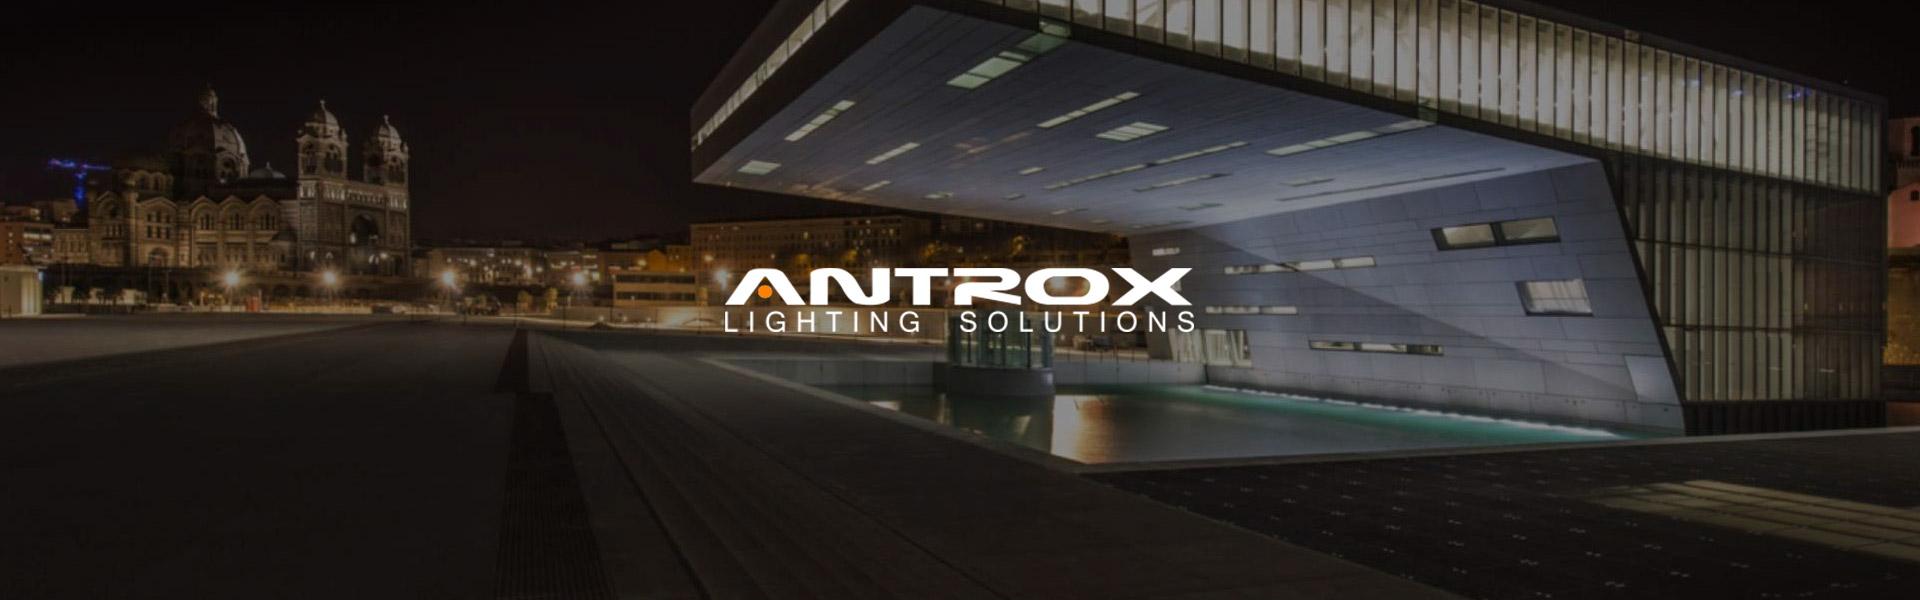 antrox_01